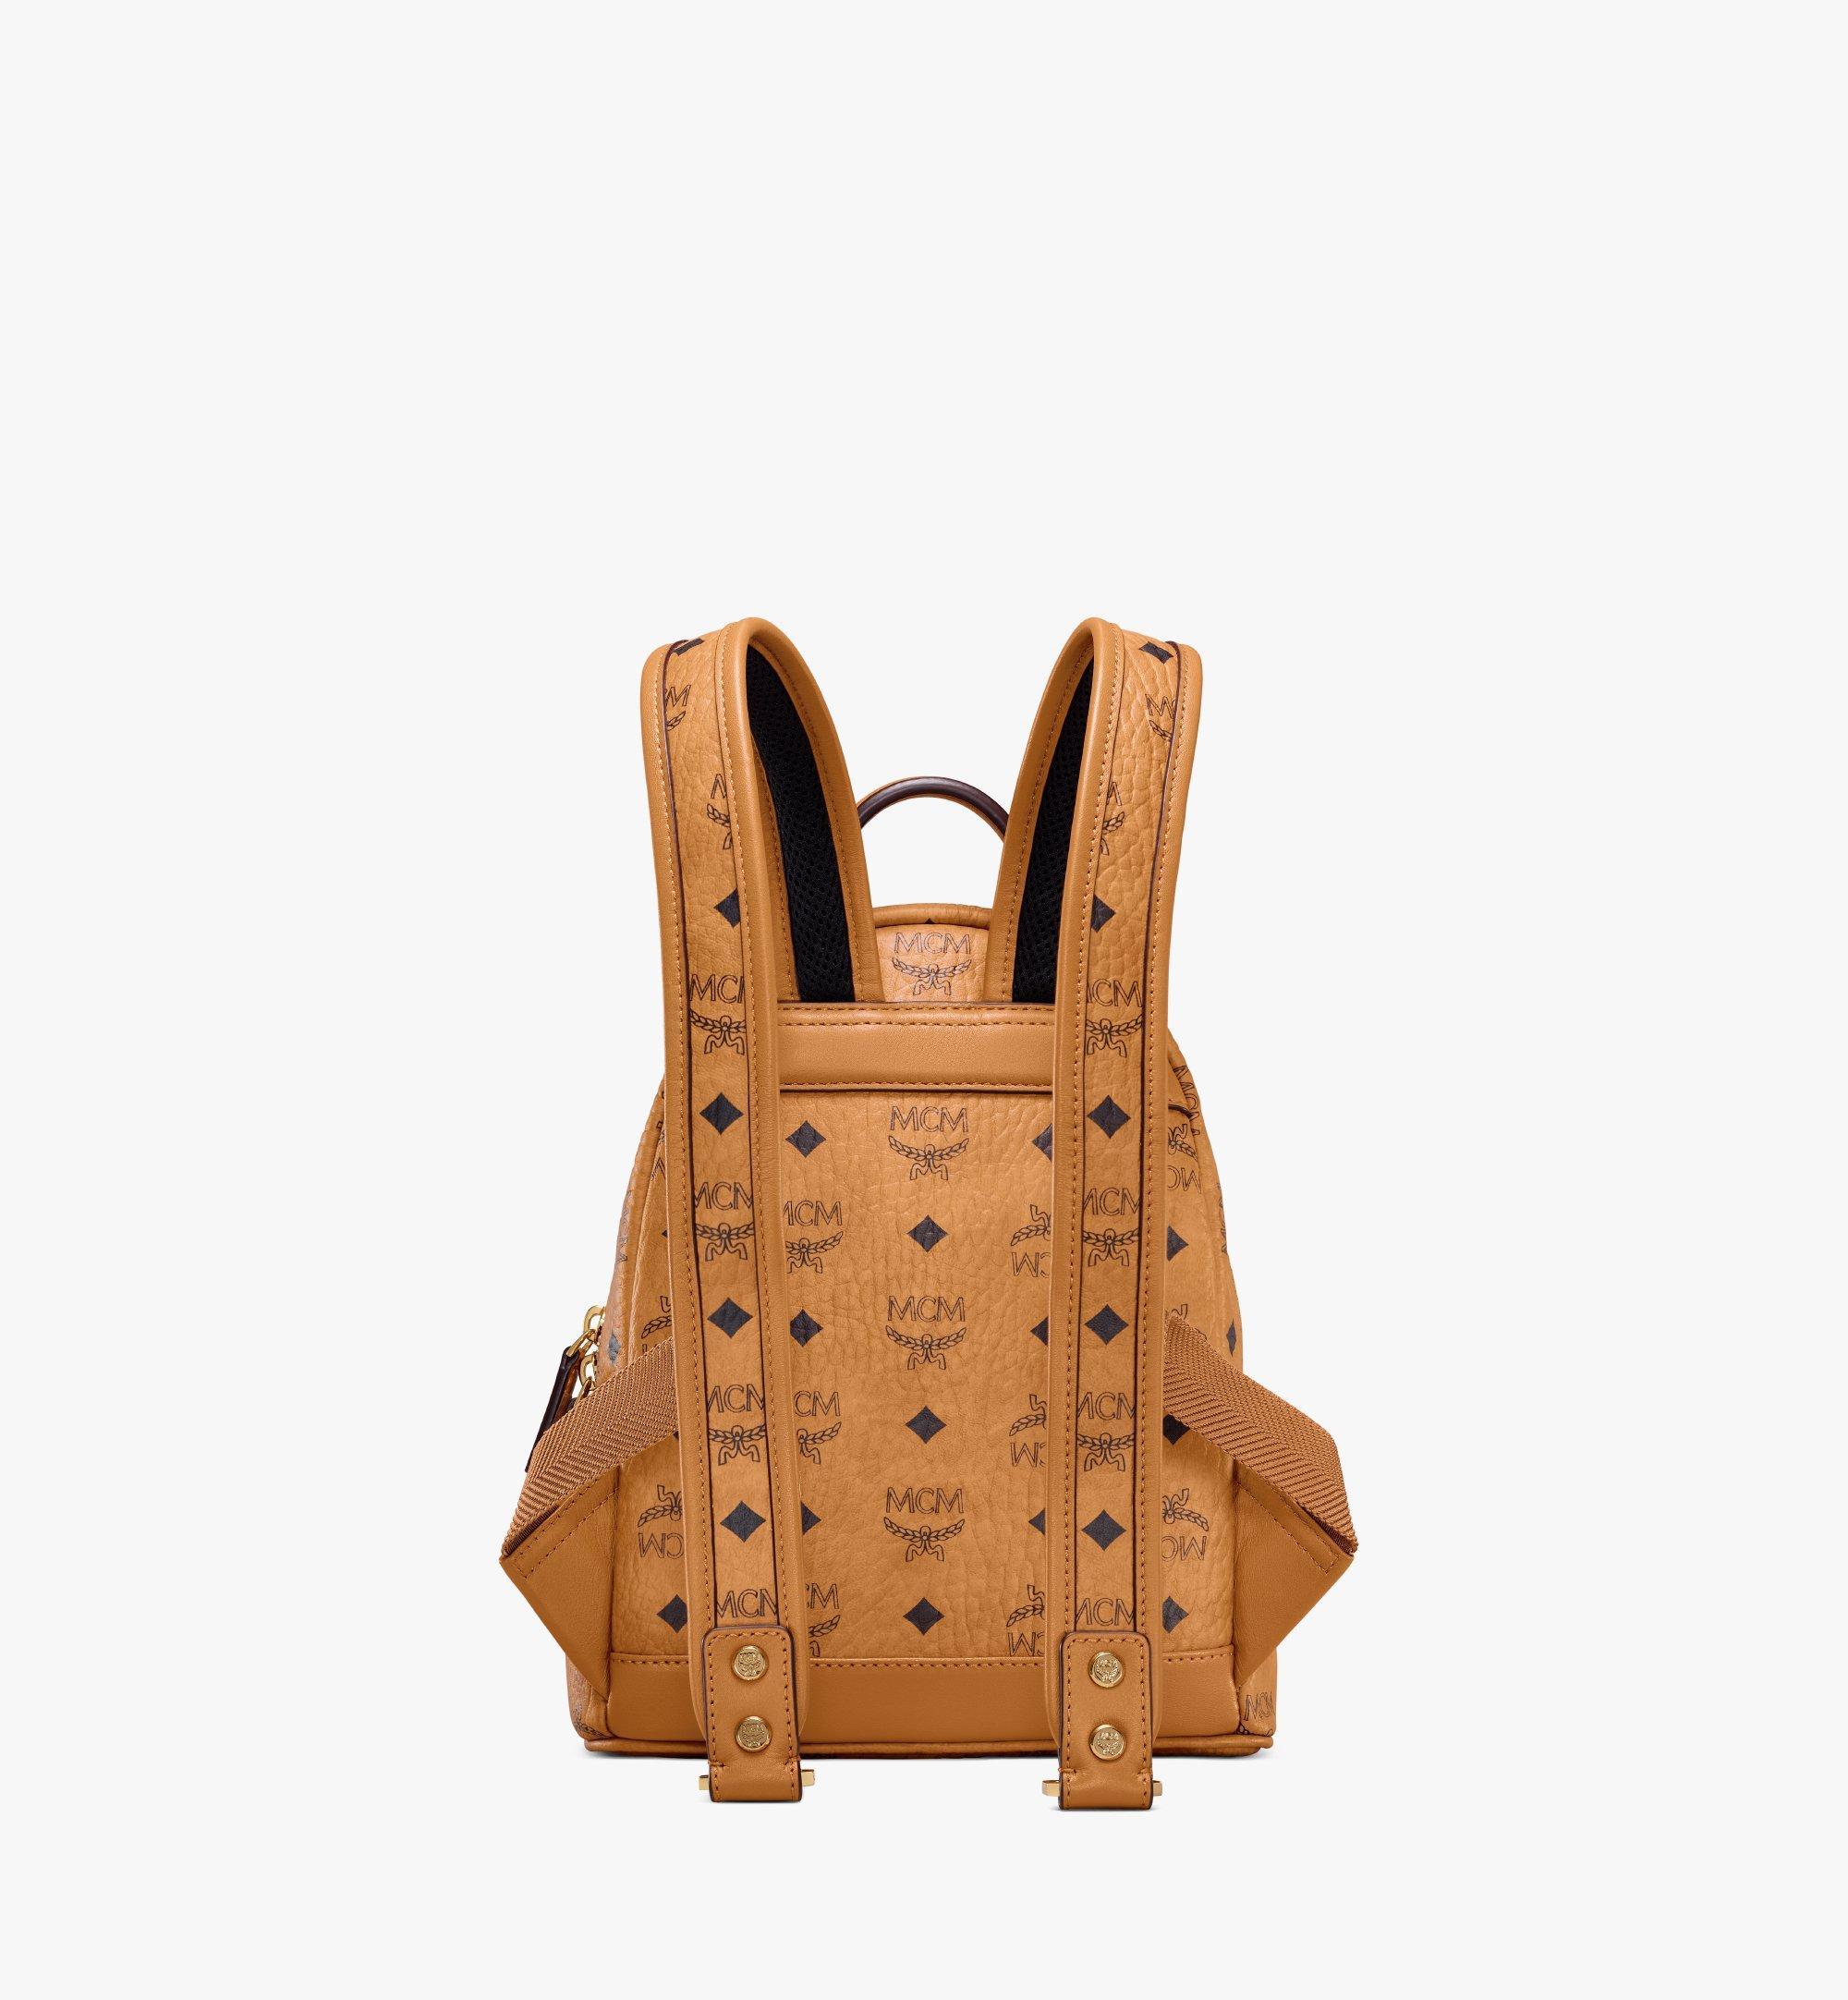 MCM Stark Side Studs Backpack in Visetos Cognac MMKAAVE10CO001 Alternate View 3